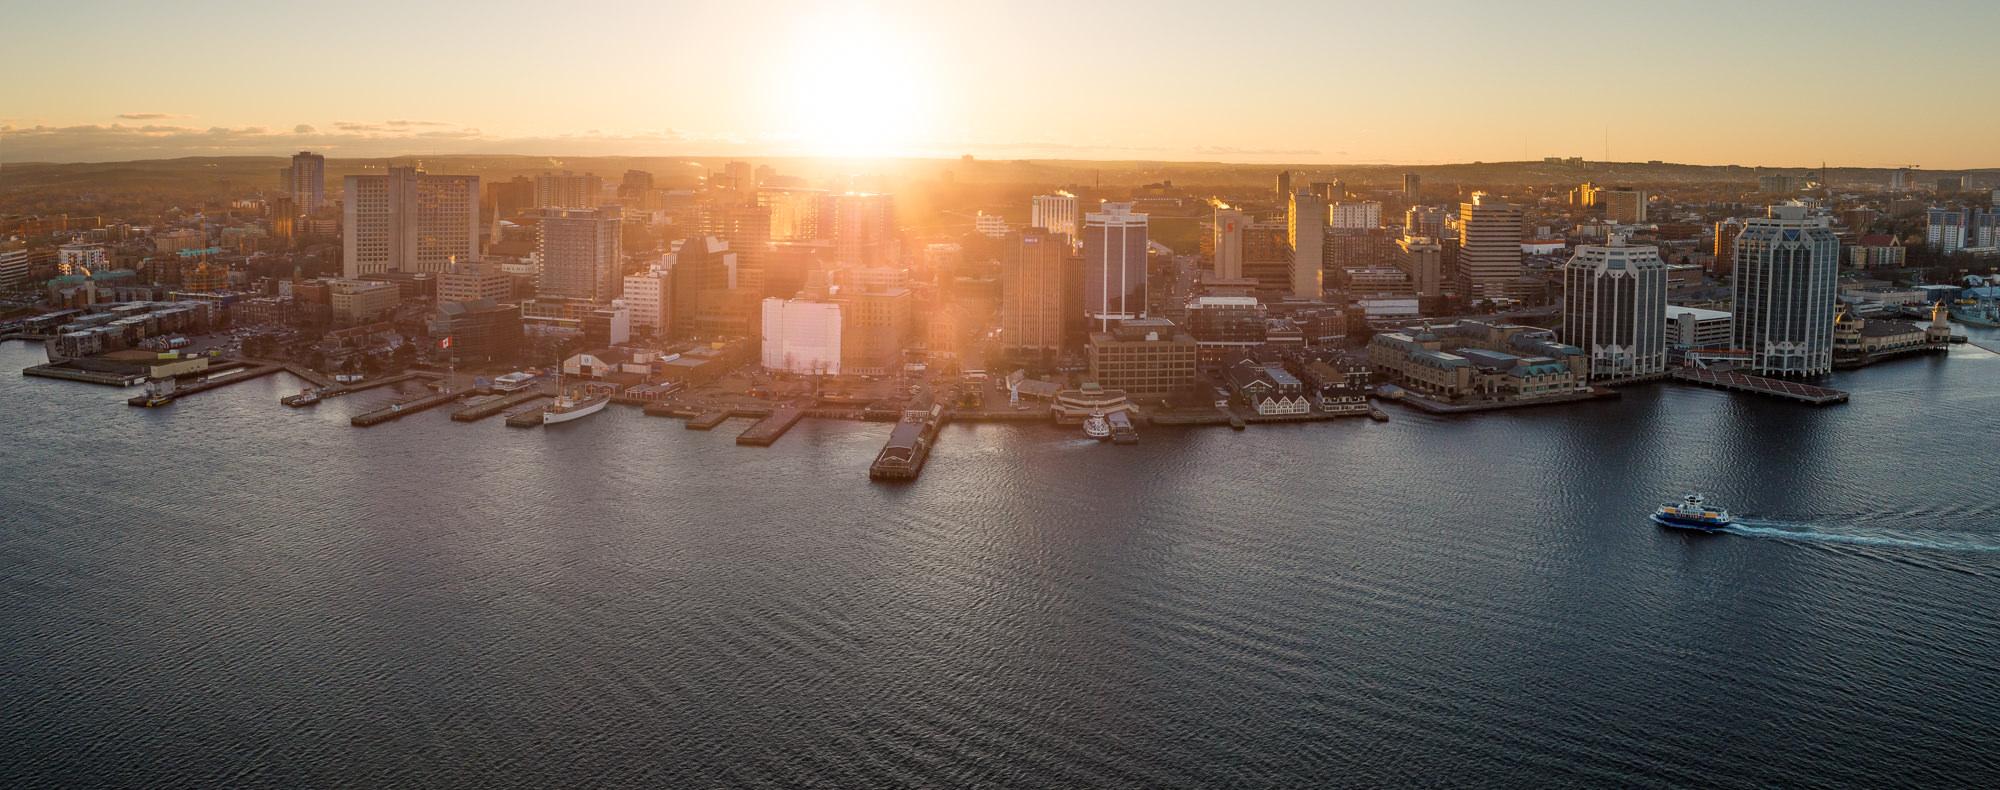 Halifax drone photography sunset.jpg